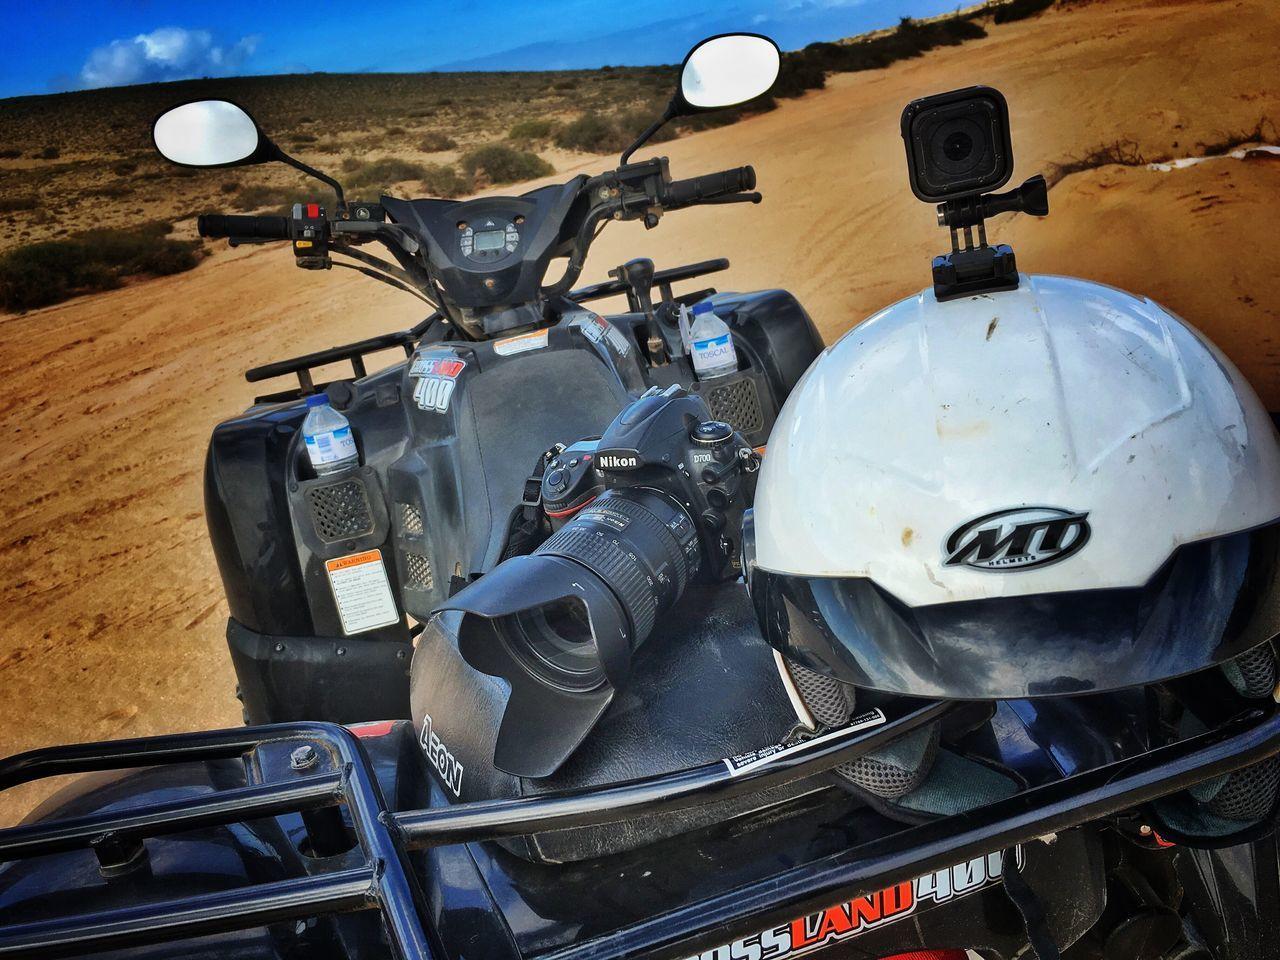 My job! Deserts Around The World Desert Offroad Gopro Photographer Photographer Life Helmet Tourism Excursion Adventure Dunes Dunebuggy Tourist Attraction  Fuerteventura Canary Islands Lifestyle